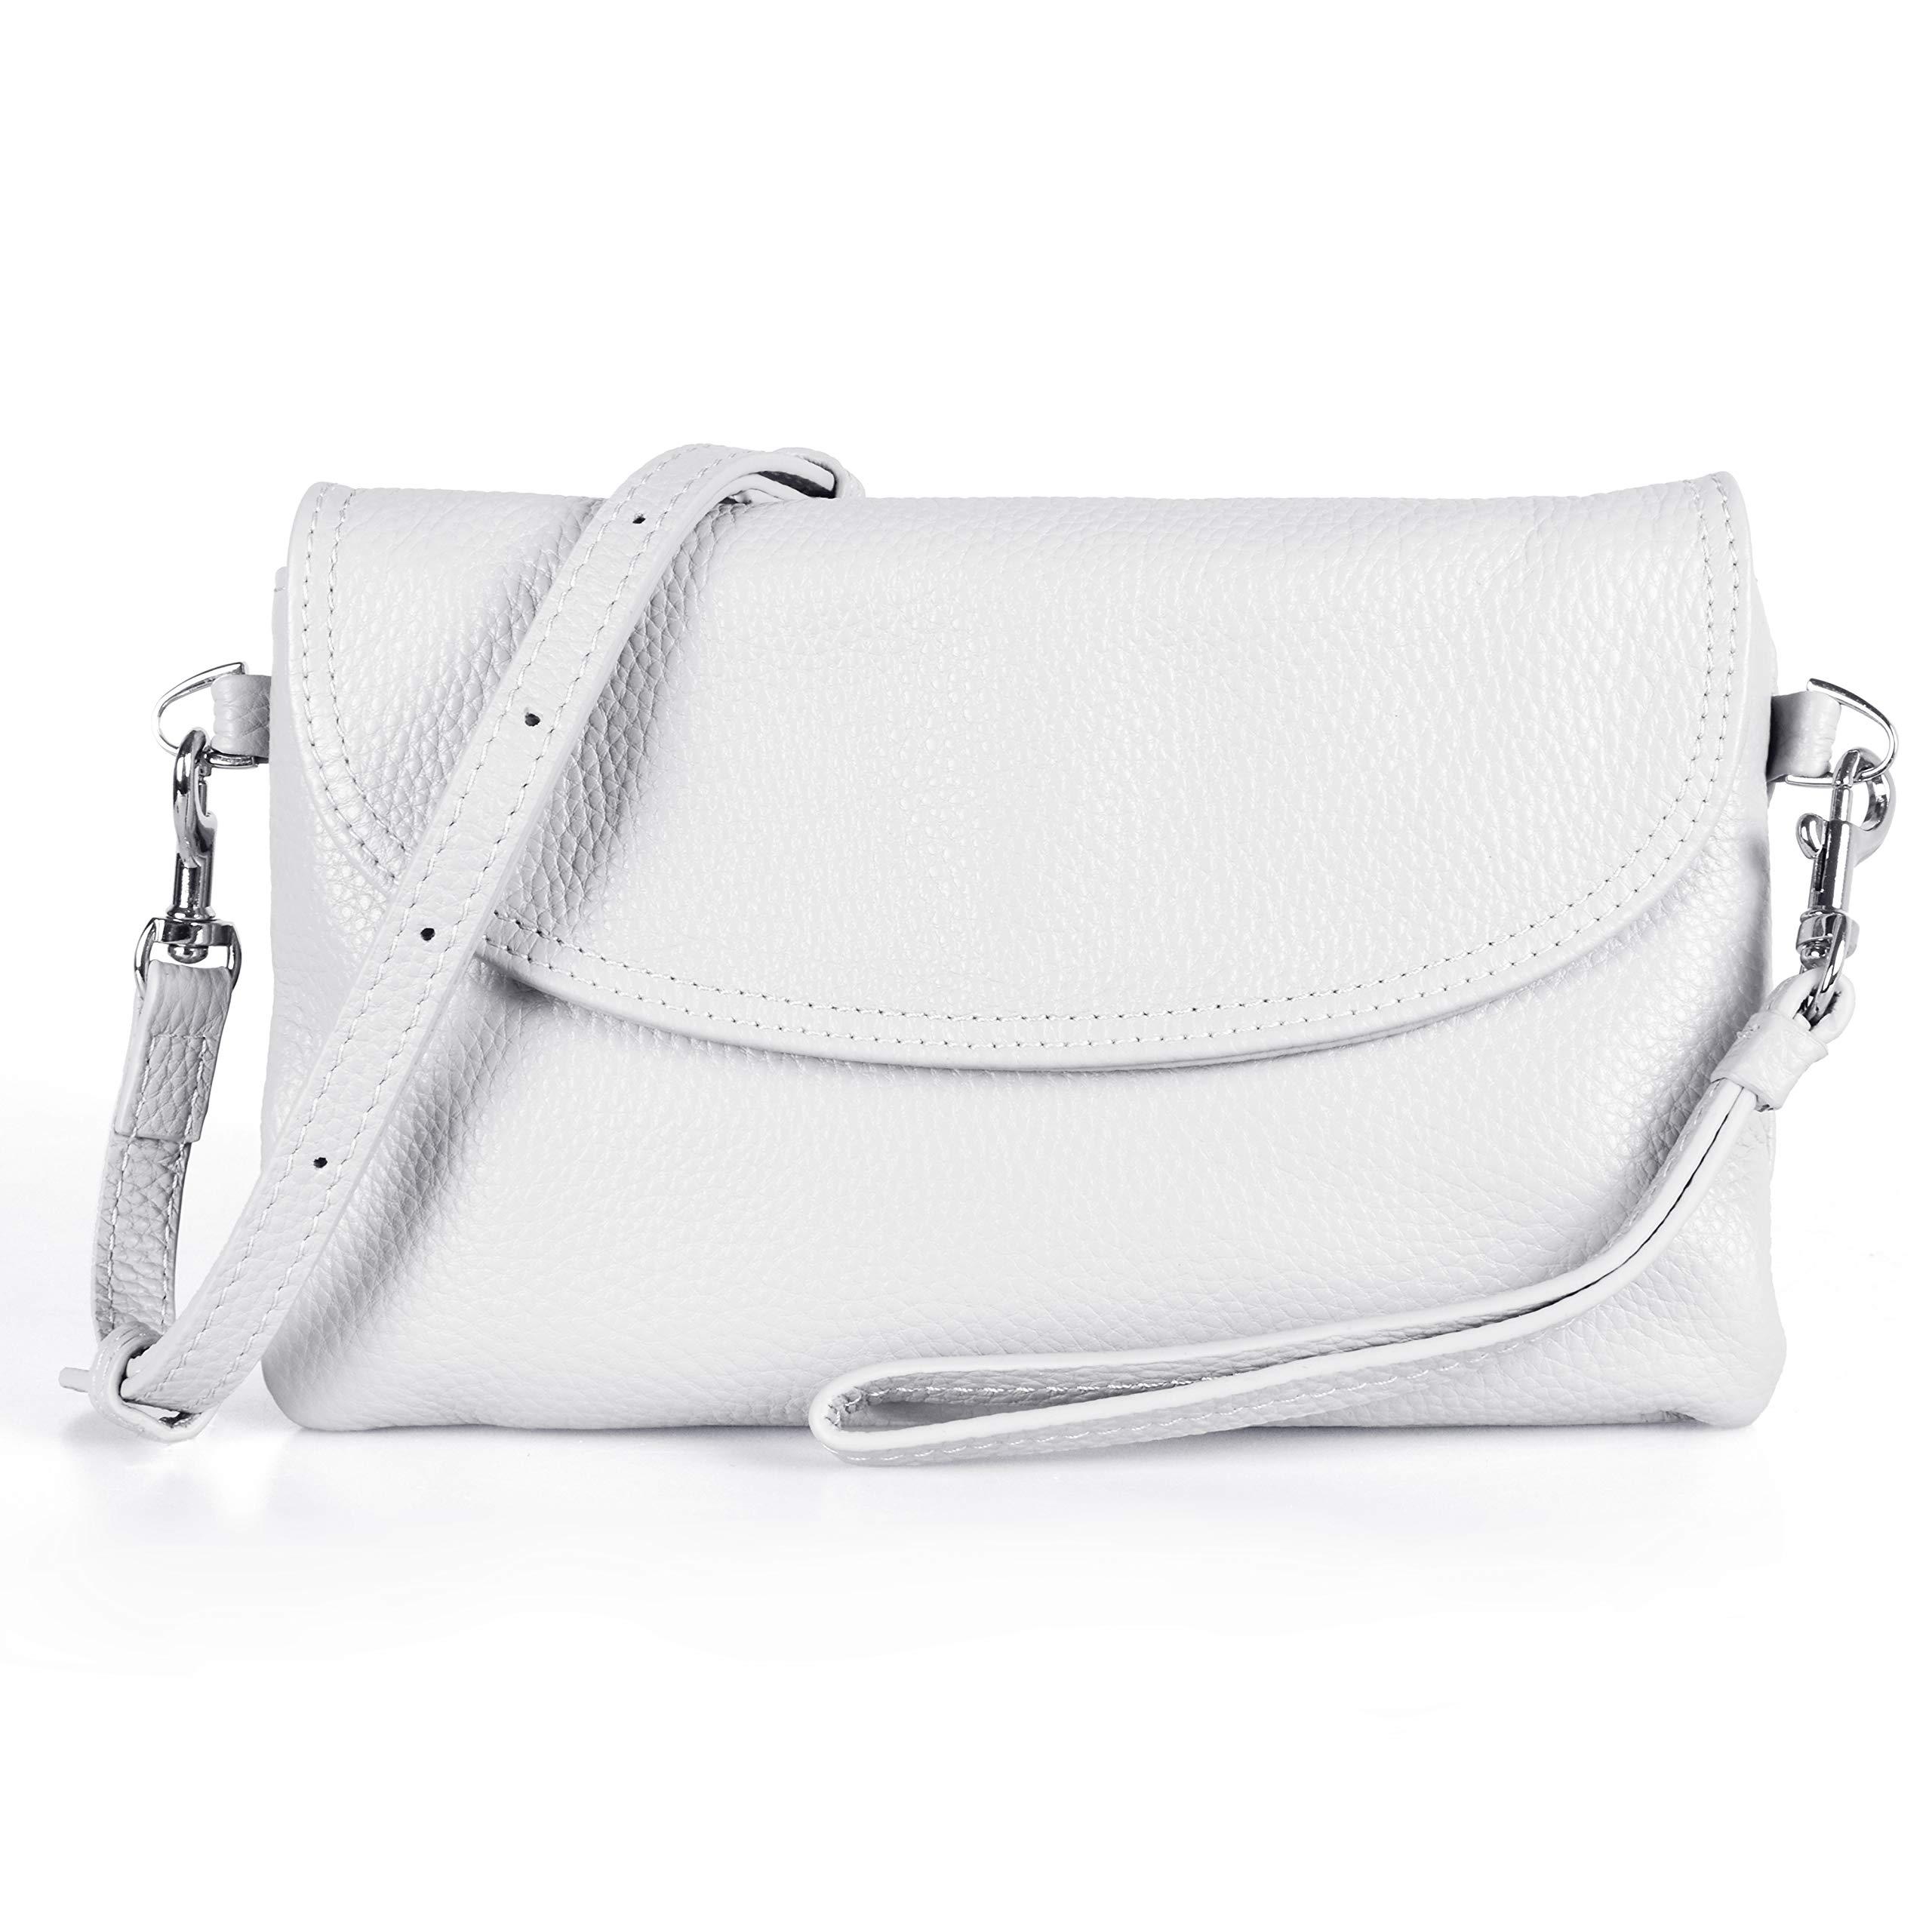 befen Full Grain Leather Wristlet Clutch Wallet Phone Crossbody Wallet Purse with Detachable Shoulder Strap (True White) by befen